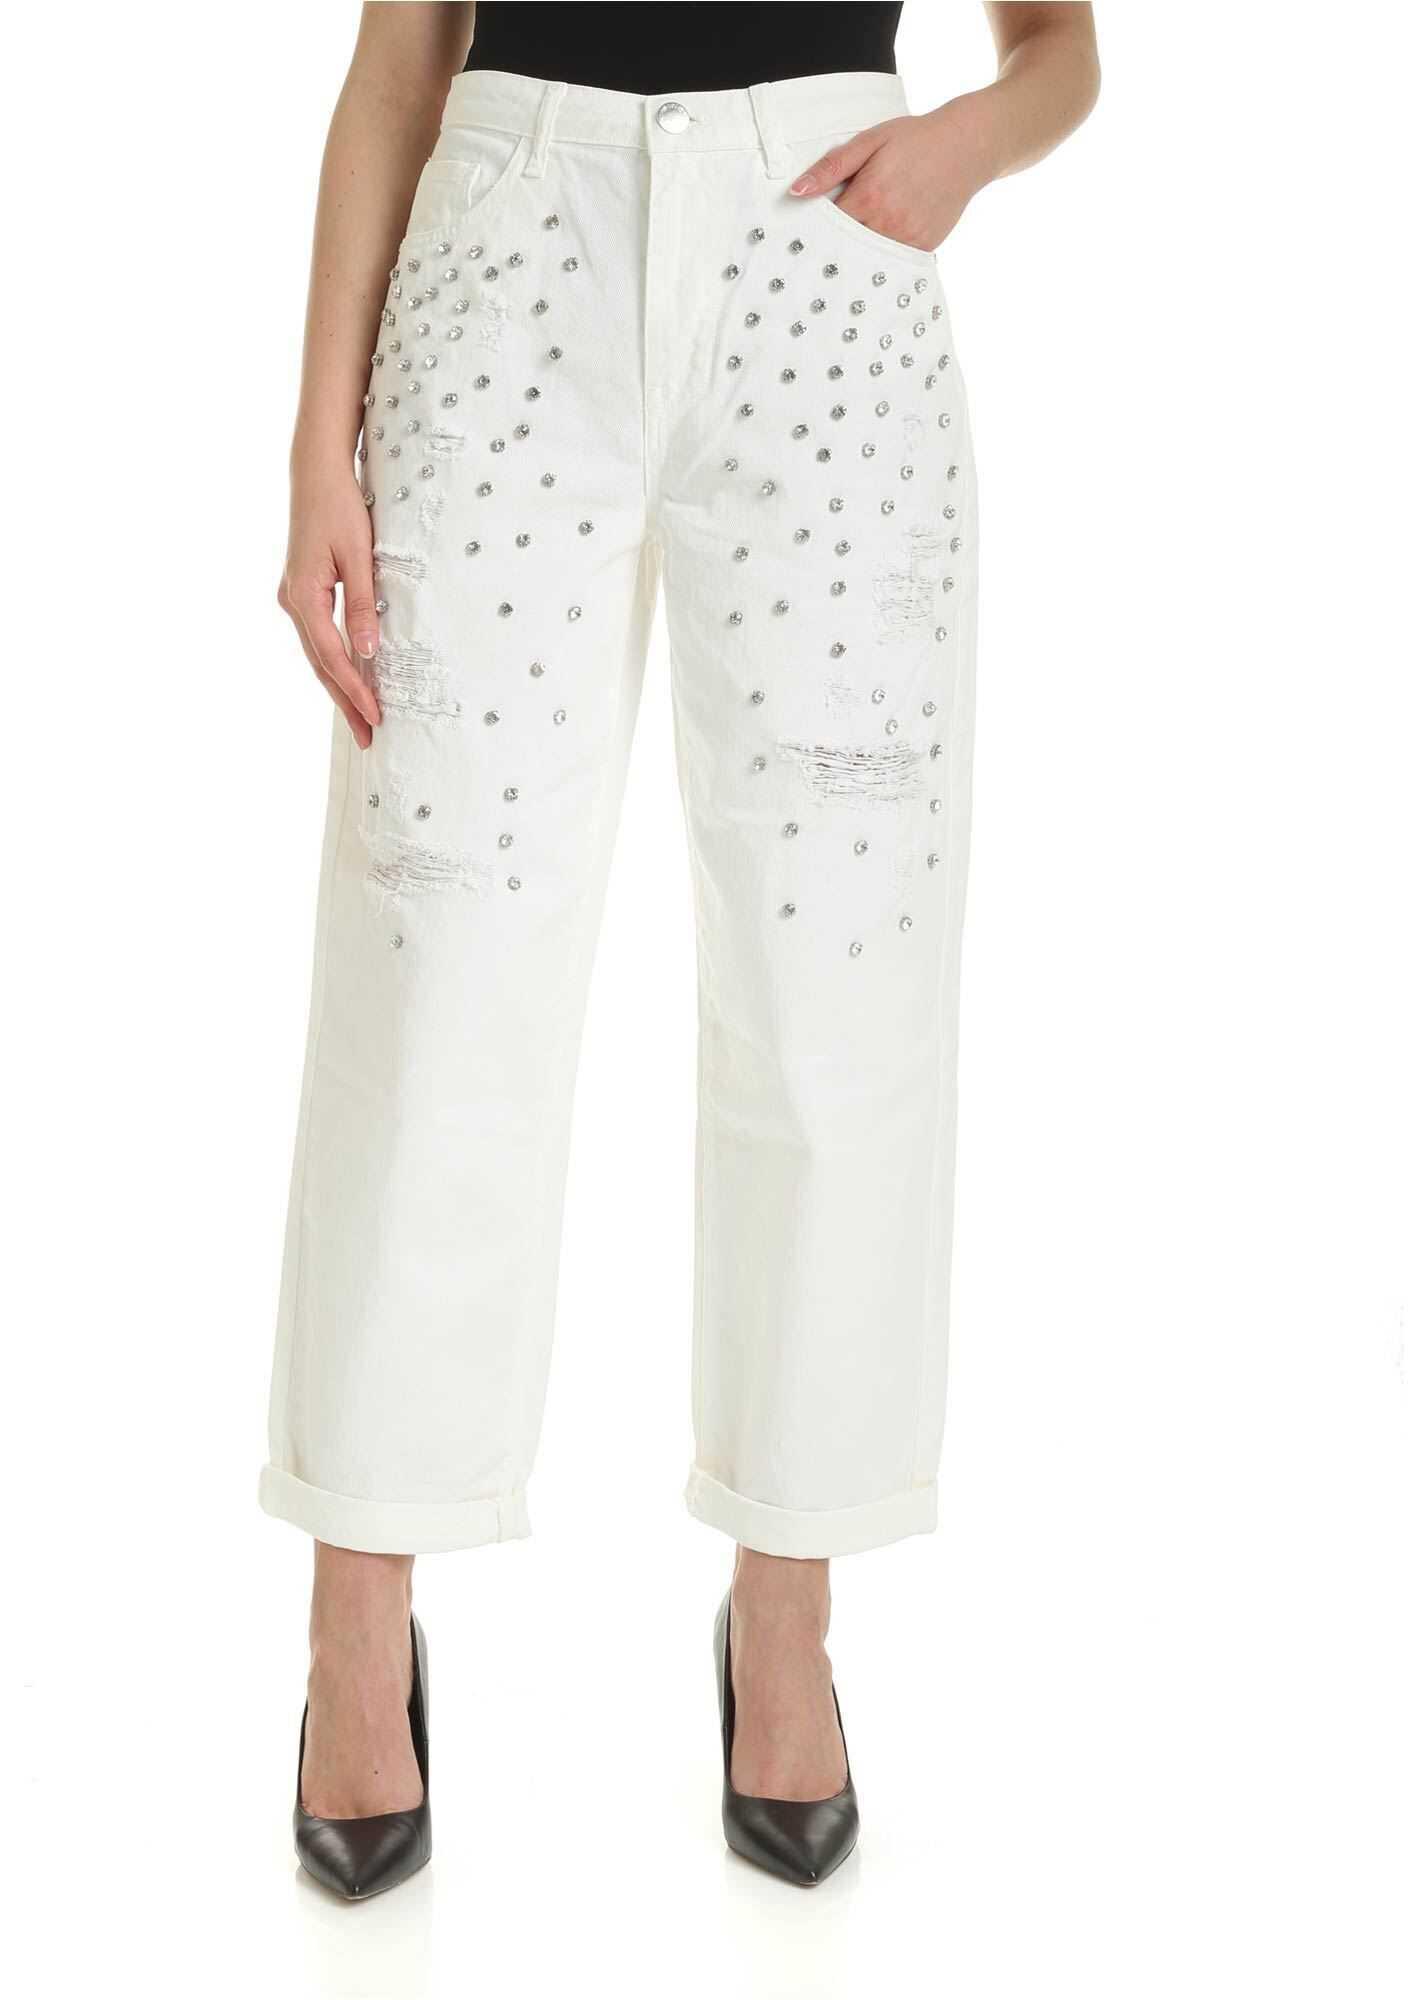 Pinko Maddie 7 Jeans In White White